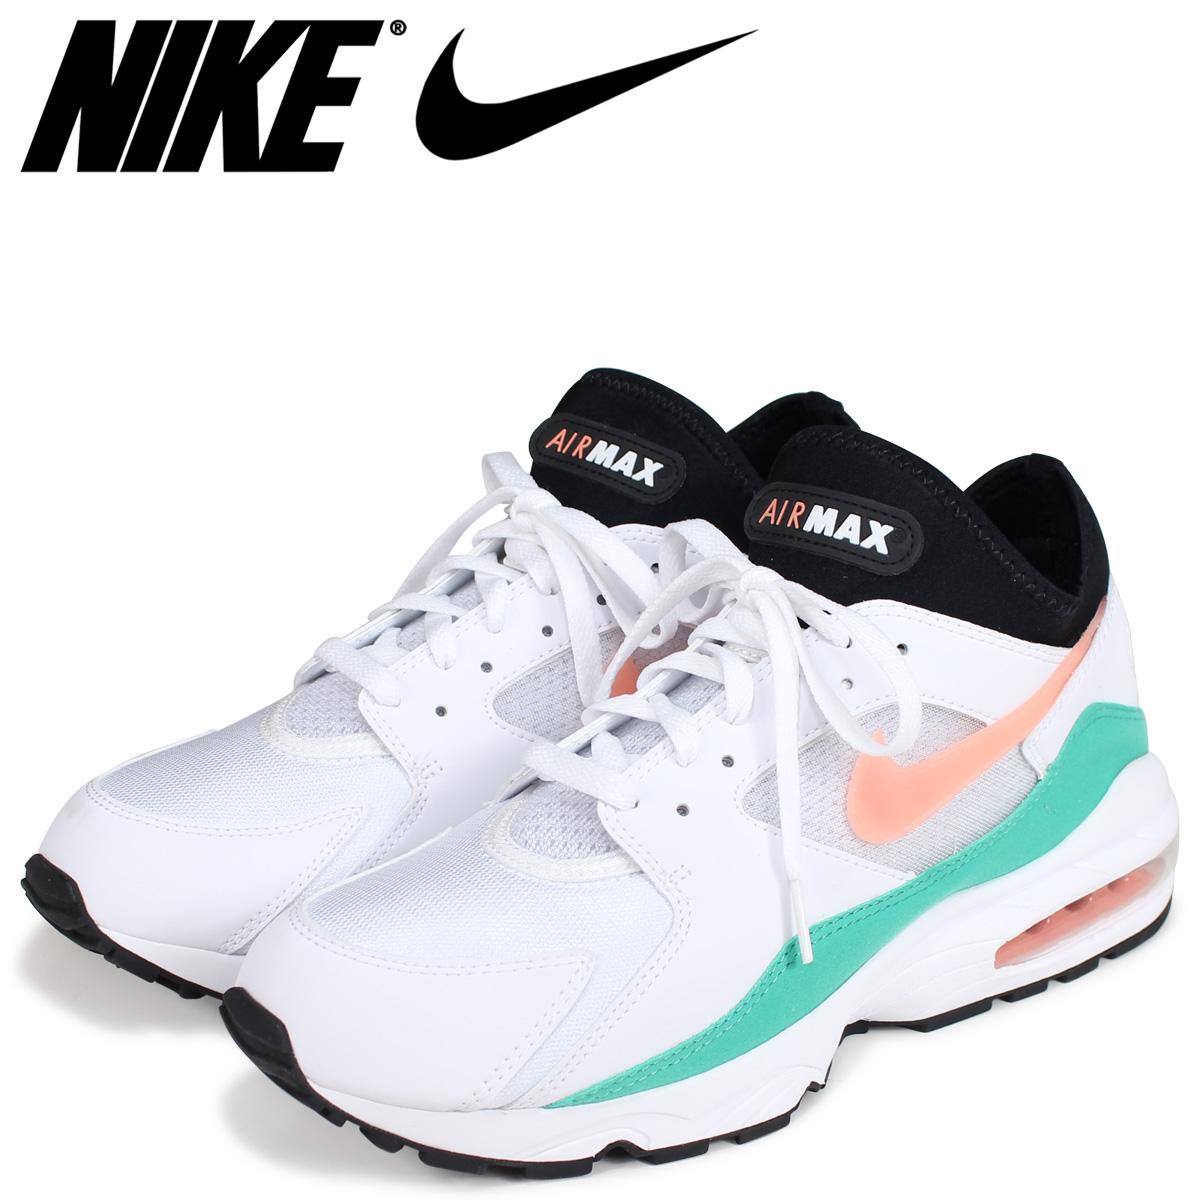 63cd21d070 NIKE Kie Ney AMAX 93 sneakers men AIR MAX 93 WATERMELON 306,551-105 white  ...